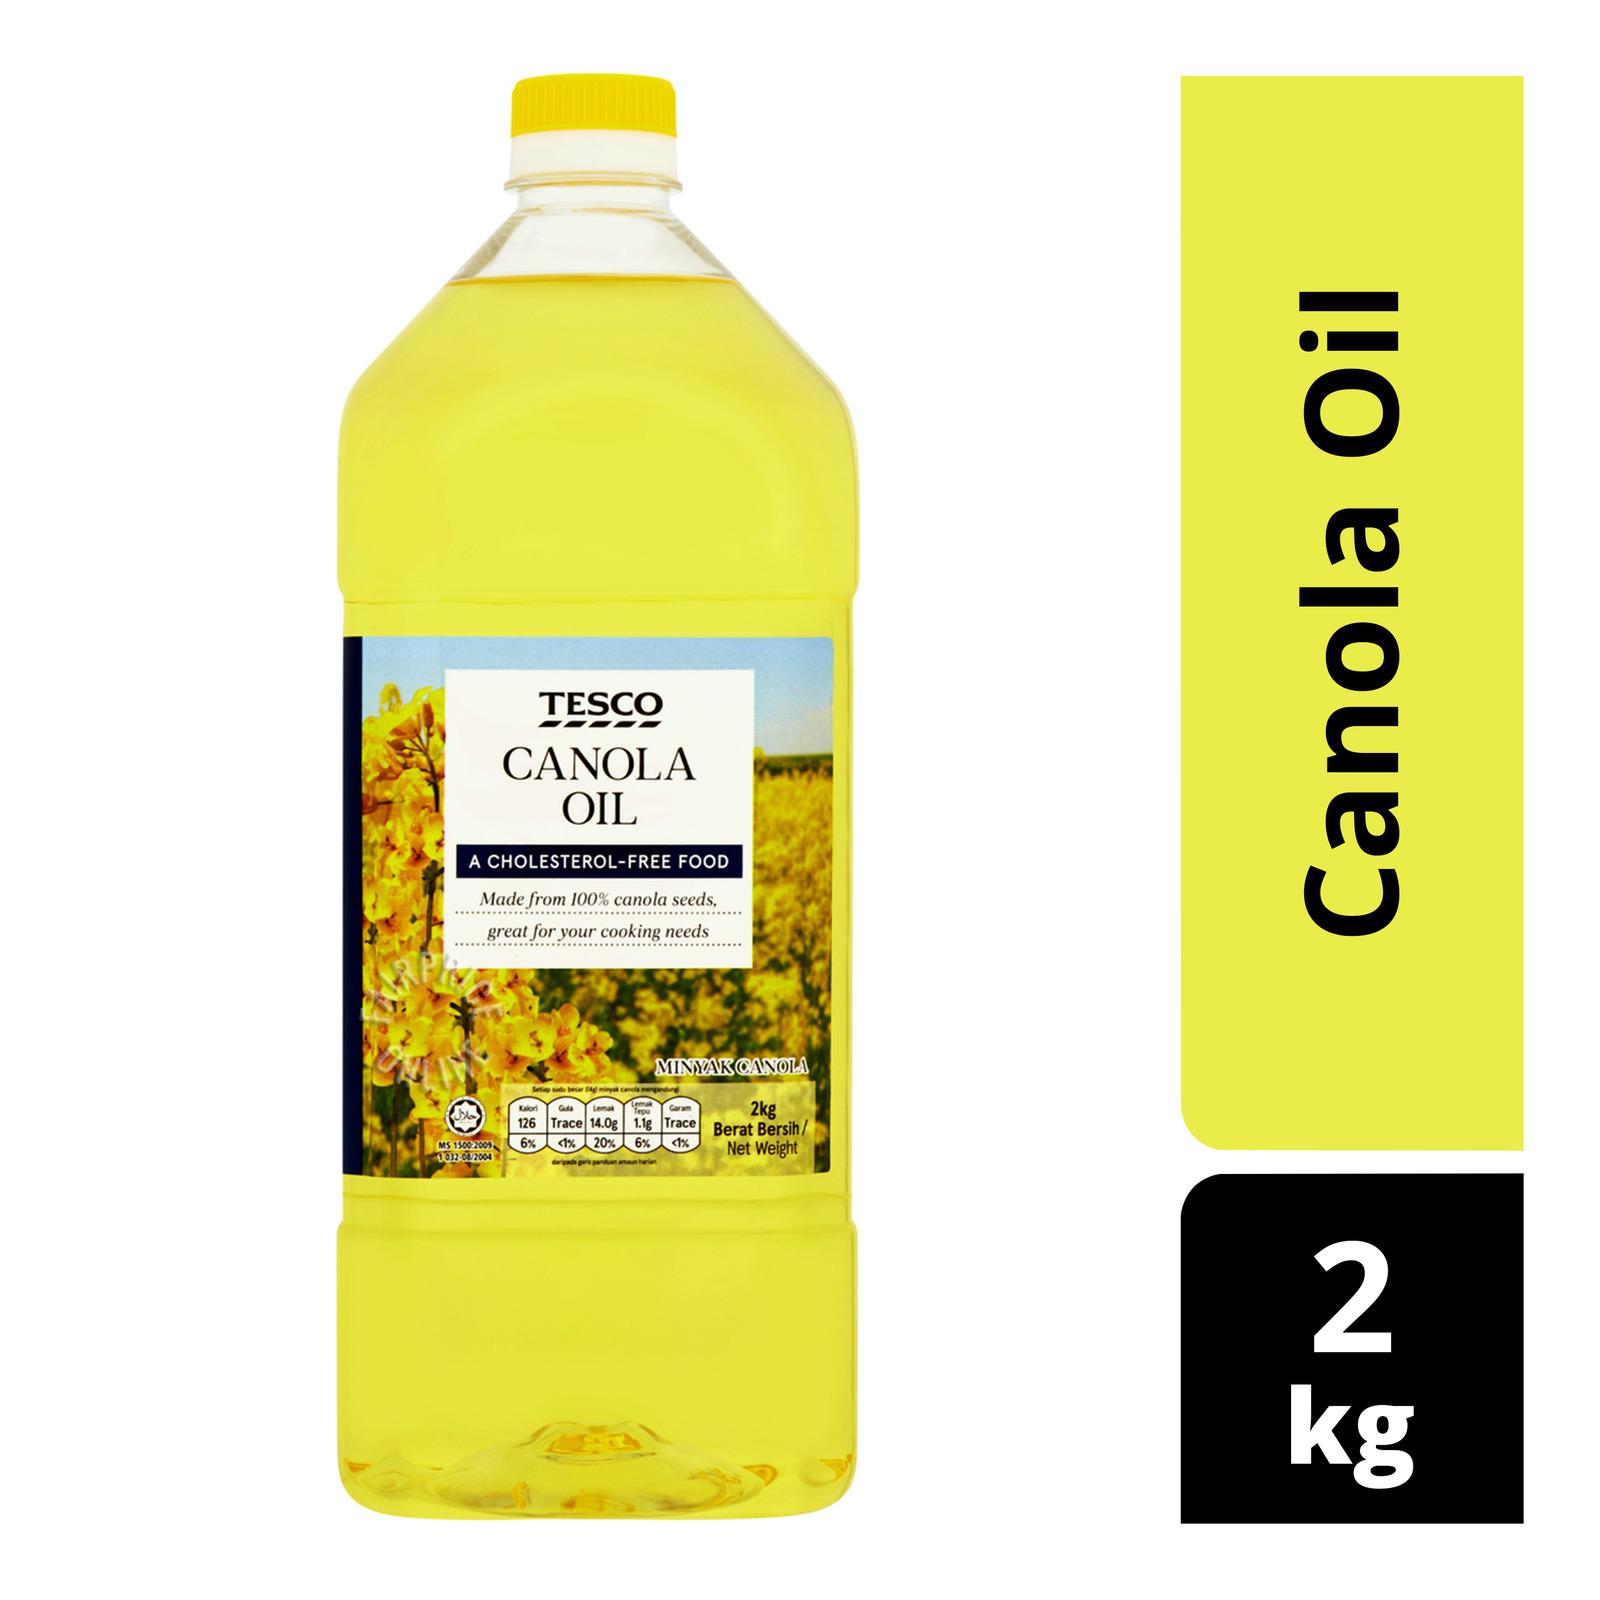 Tesco Canola Oil